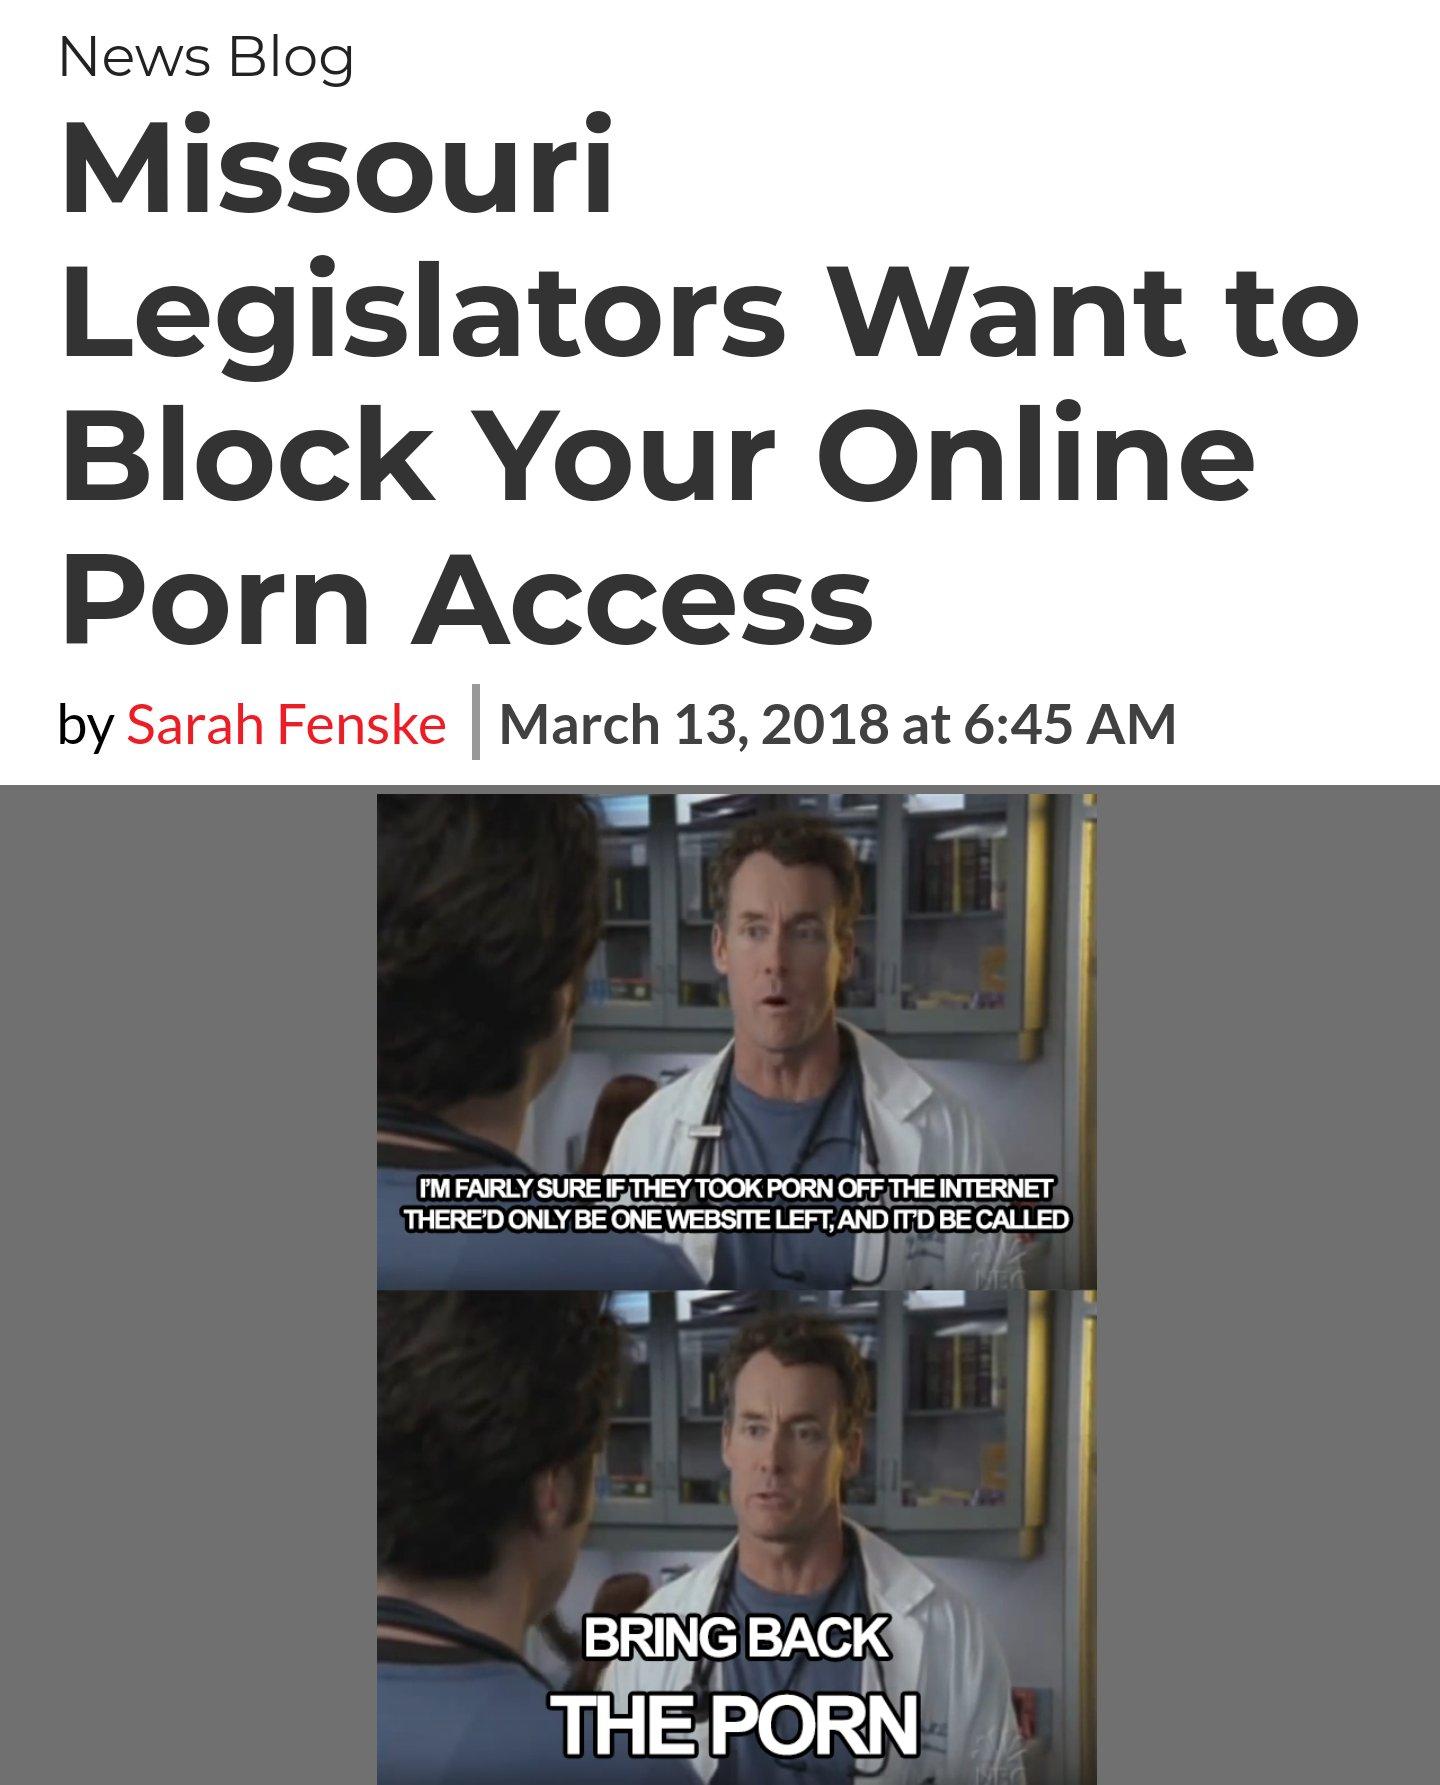 #I #wonder #if #they'd #block #the #'I #Hate #Cox' #chatroom https://t.co/bLvpylTeef  #shitgotdeep,#Scrubs https://t.co/ssSiX6qMtM